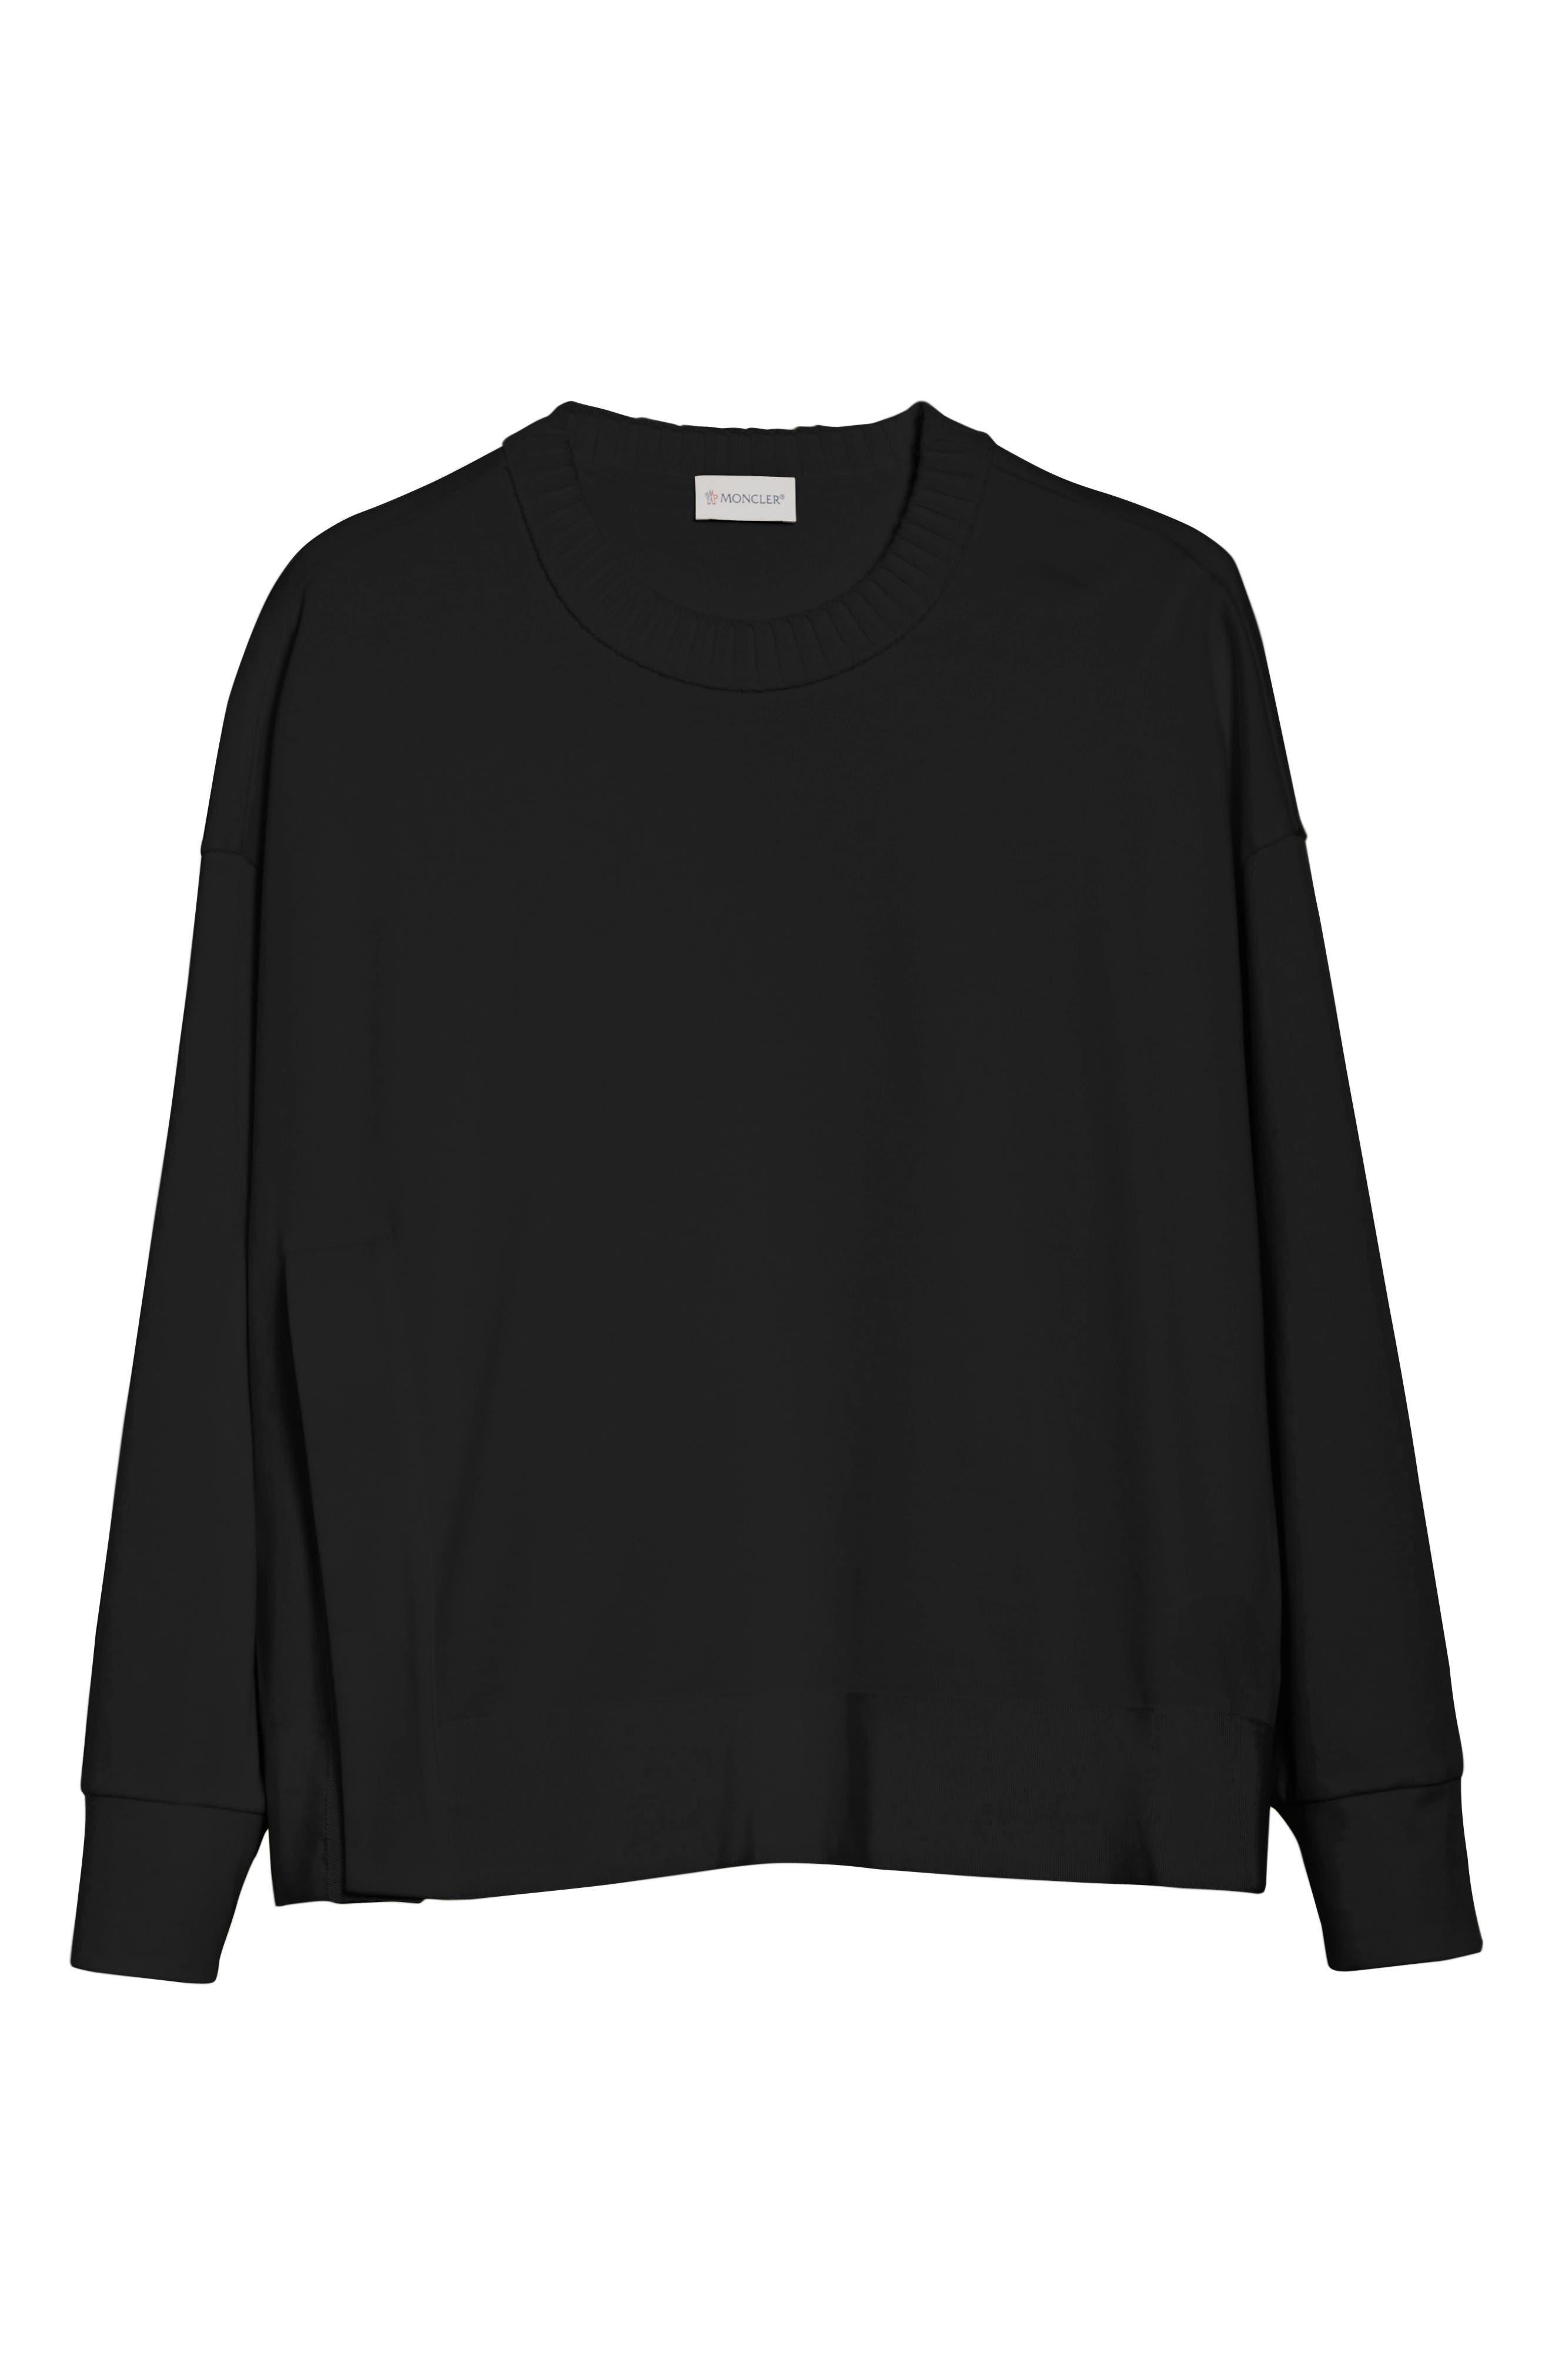 Cotton Sweatshirt,                             Alternate thumbnail 6, color,                             Black